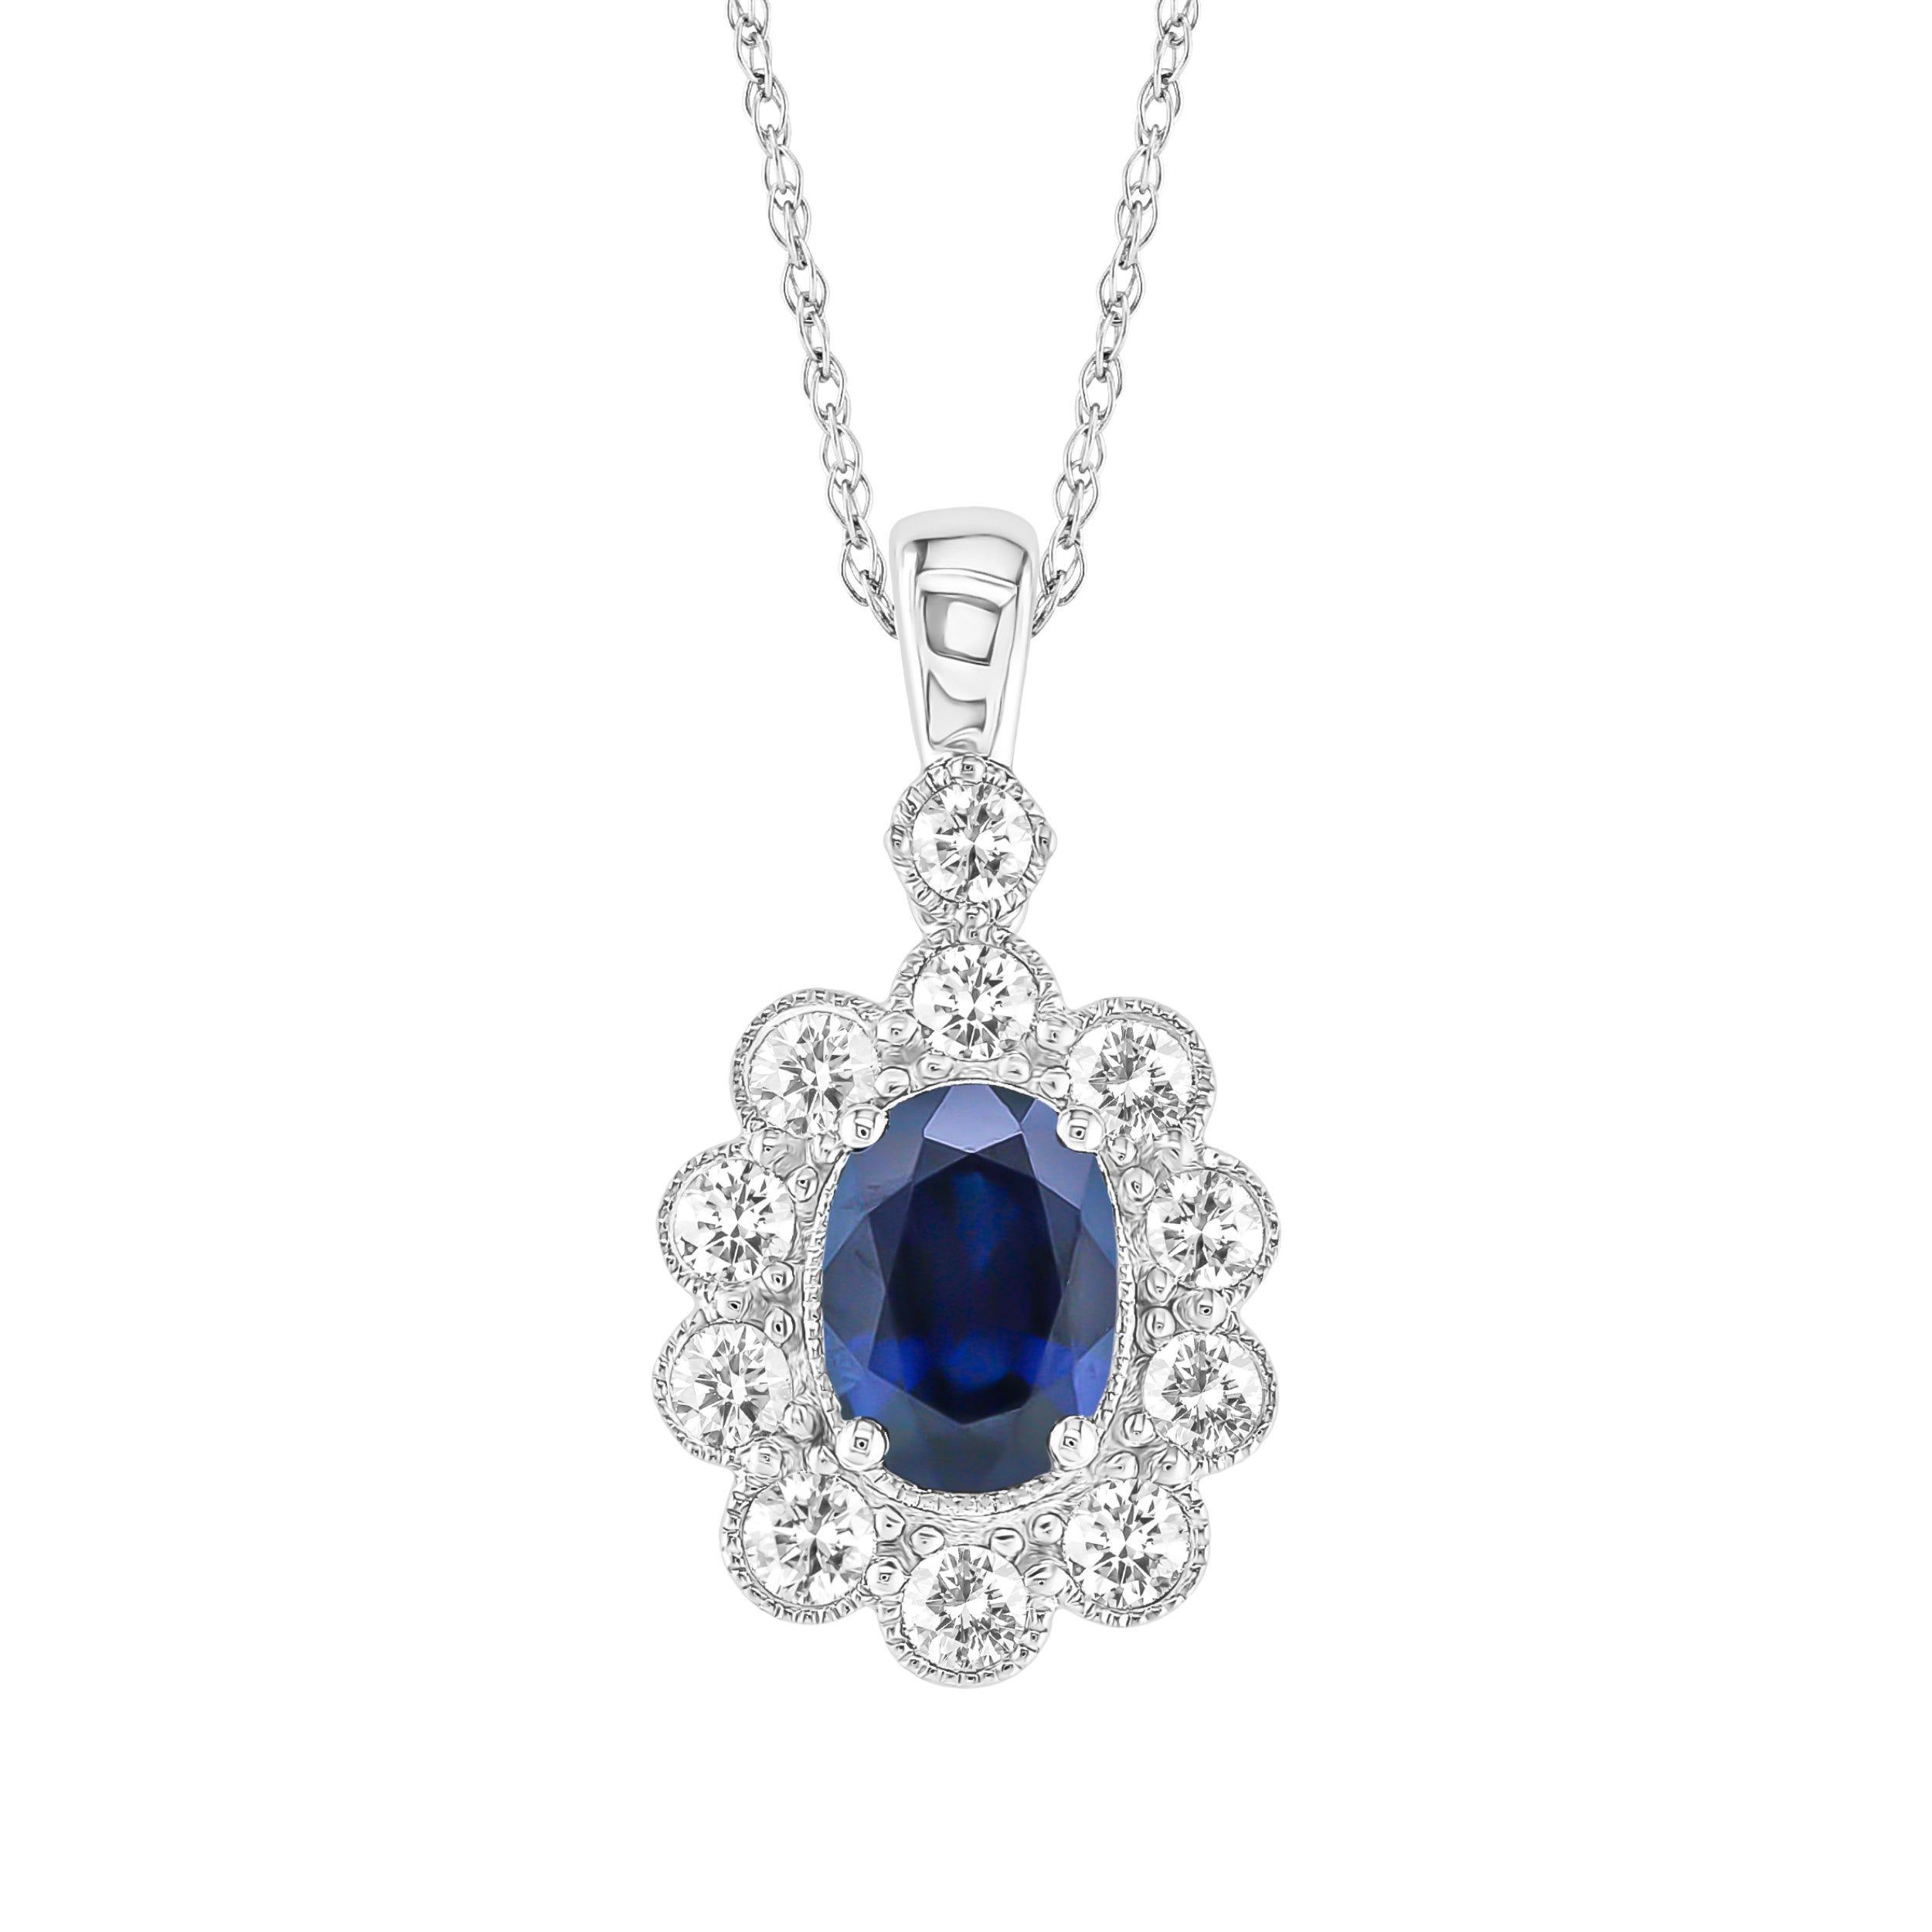 Sapphire & Diamond Oval Pendant in 10k White Gold